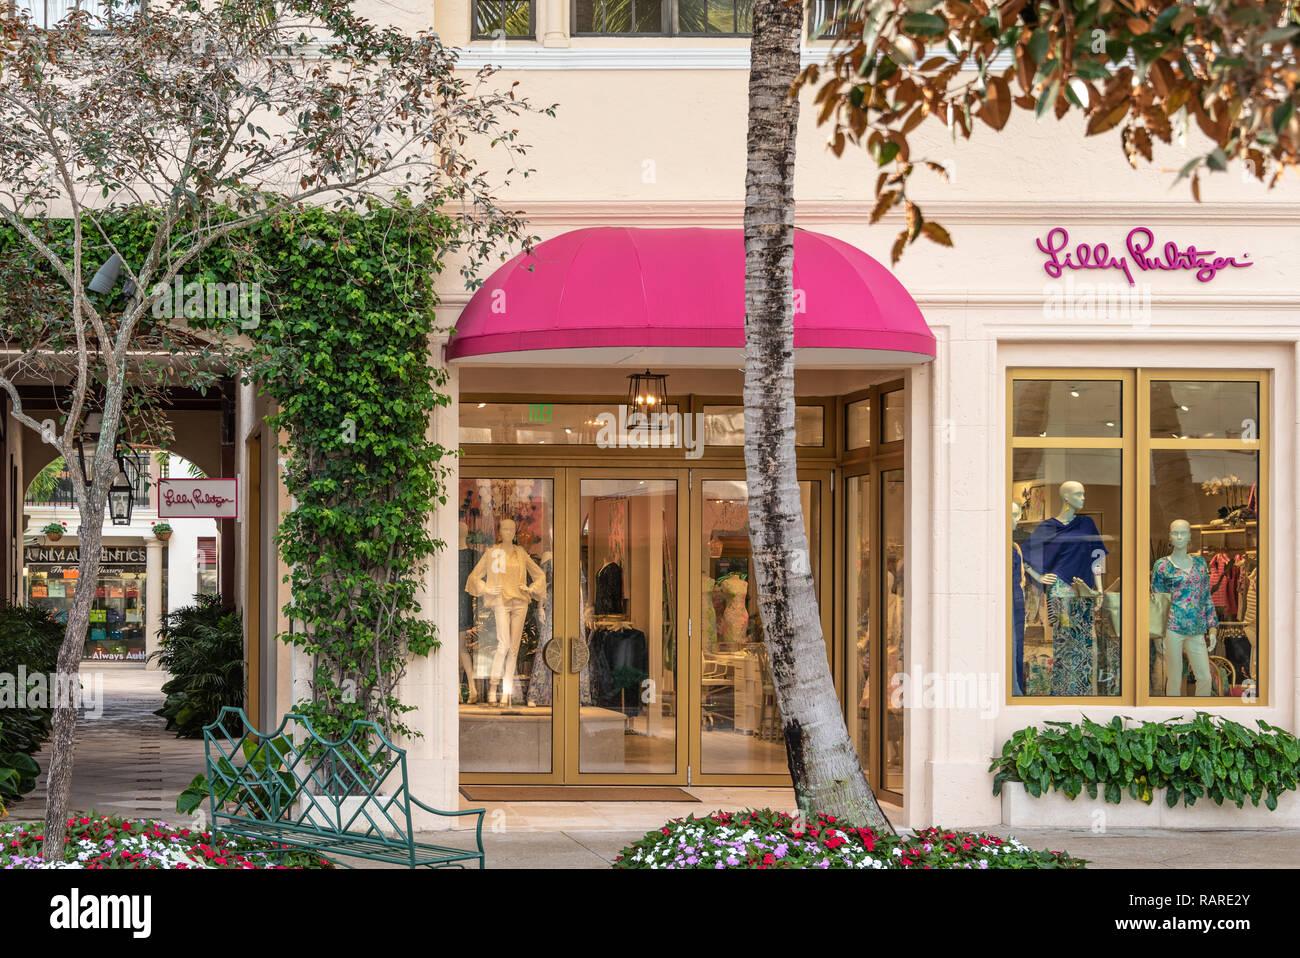 e99de16310066f Lilly Pulitzer store on Worth Avenue in Palm Beach, Florida. (USA) -